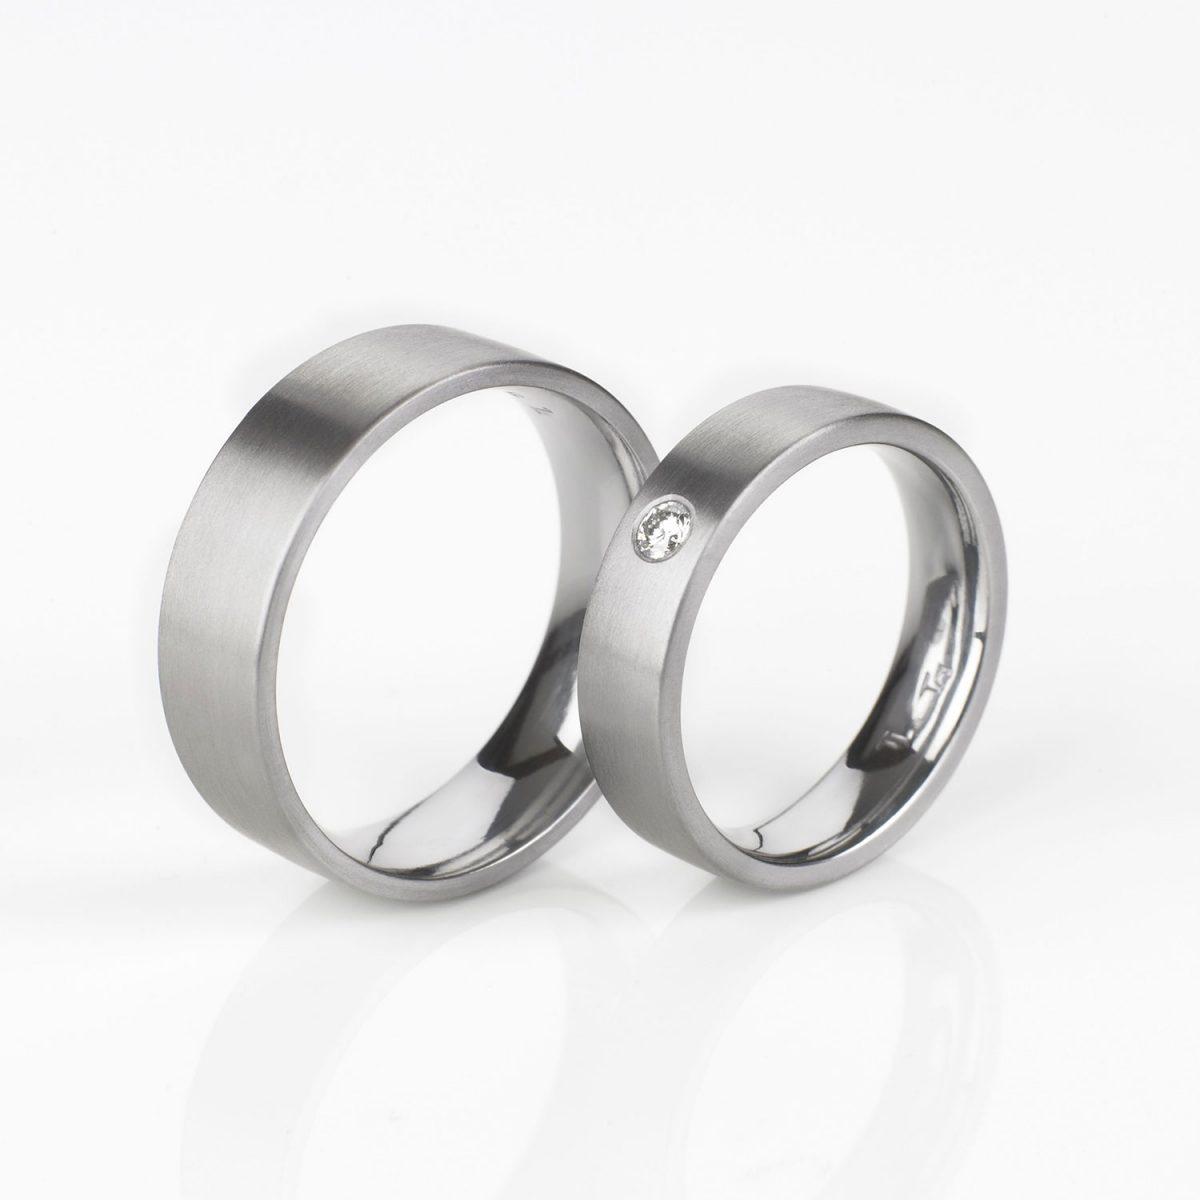 Tantal Hochzeitsringe | Eheringe | Ringpaar True Love Collection No:30